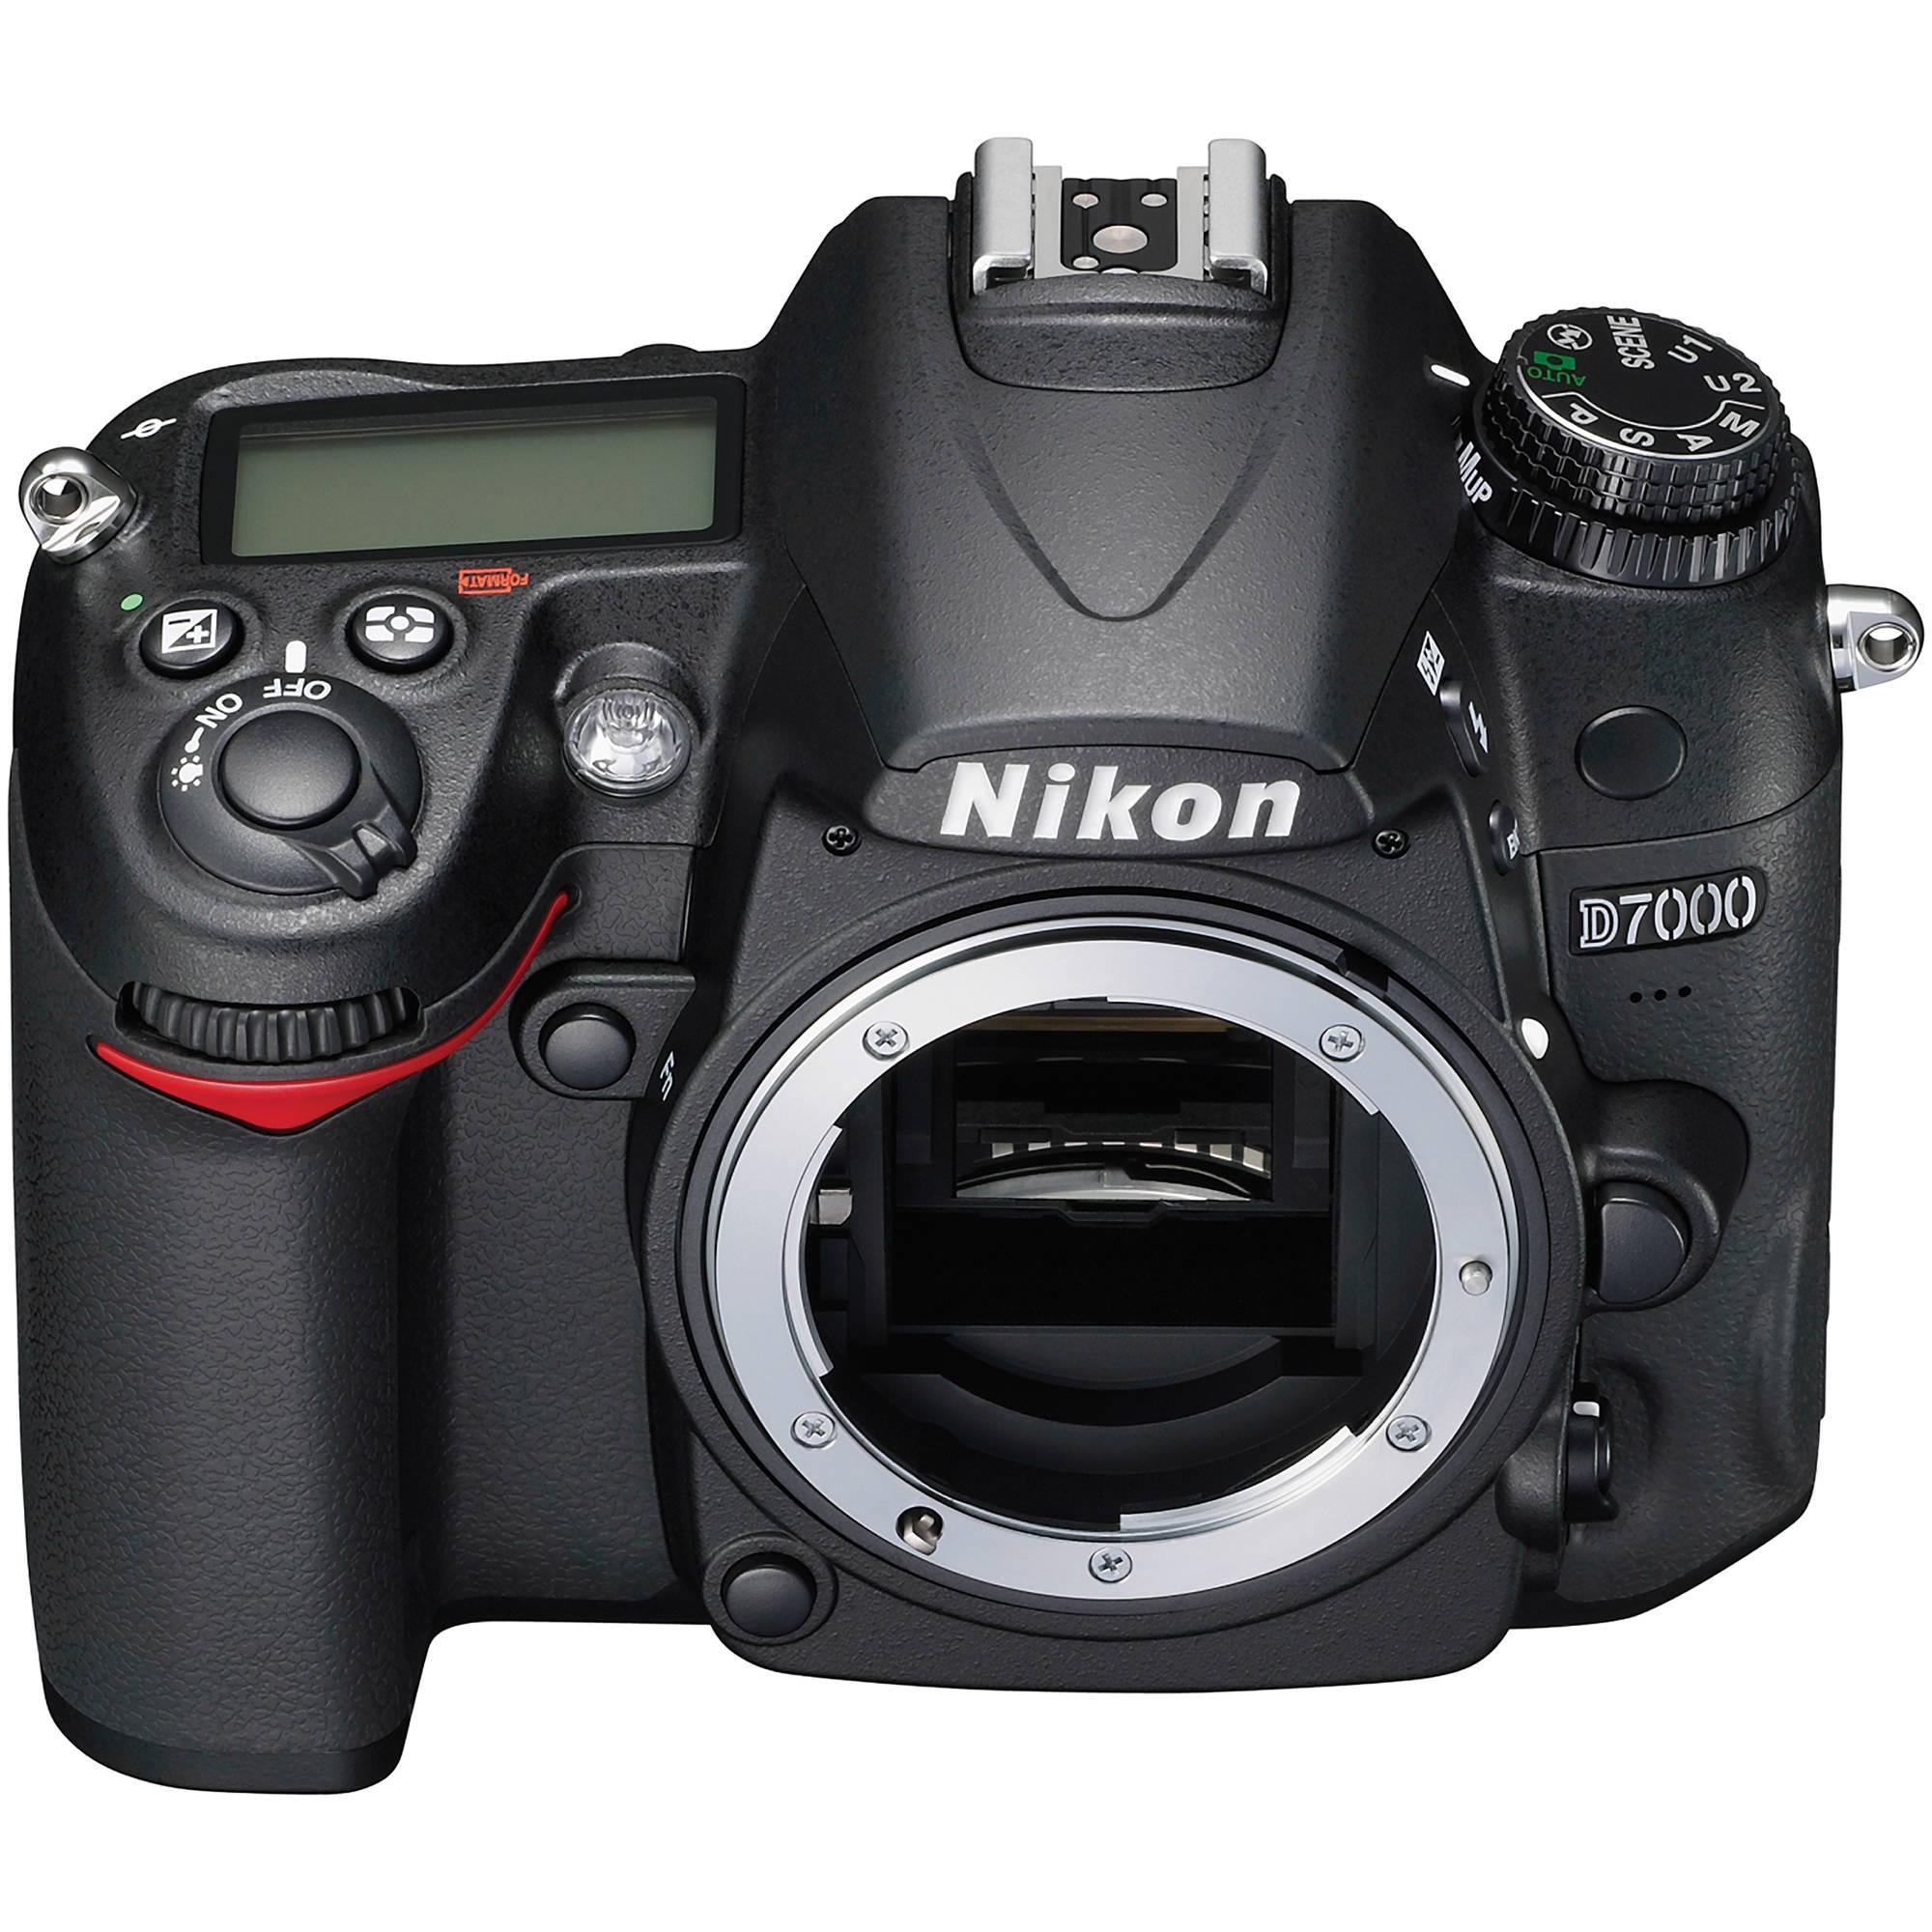 CABLE USB GPS FOR NIKON D7000 D 7000